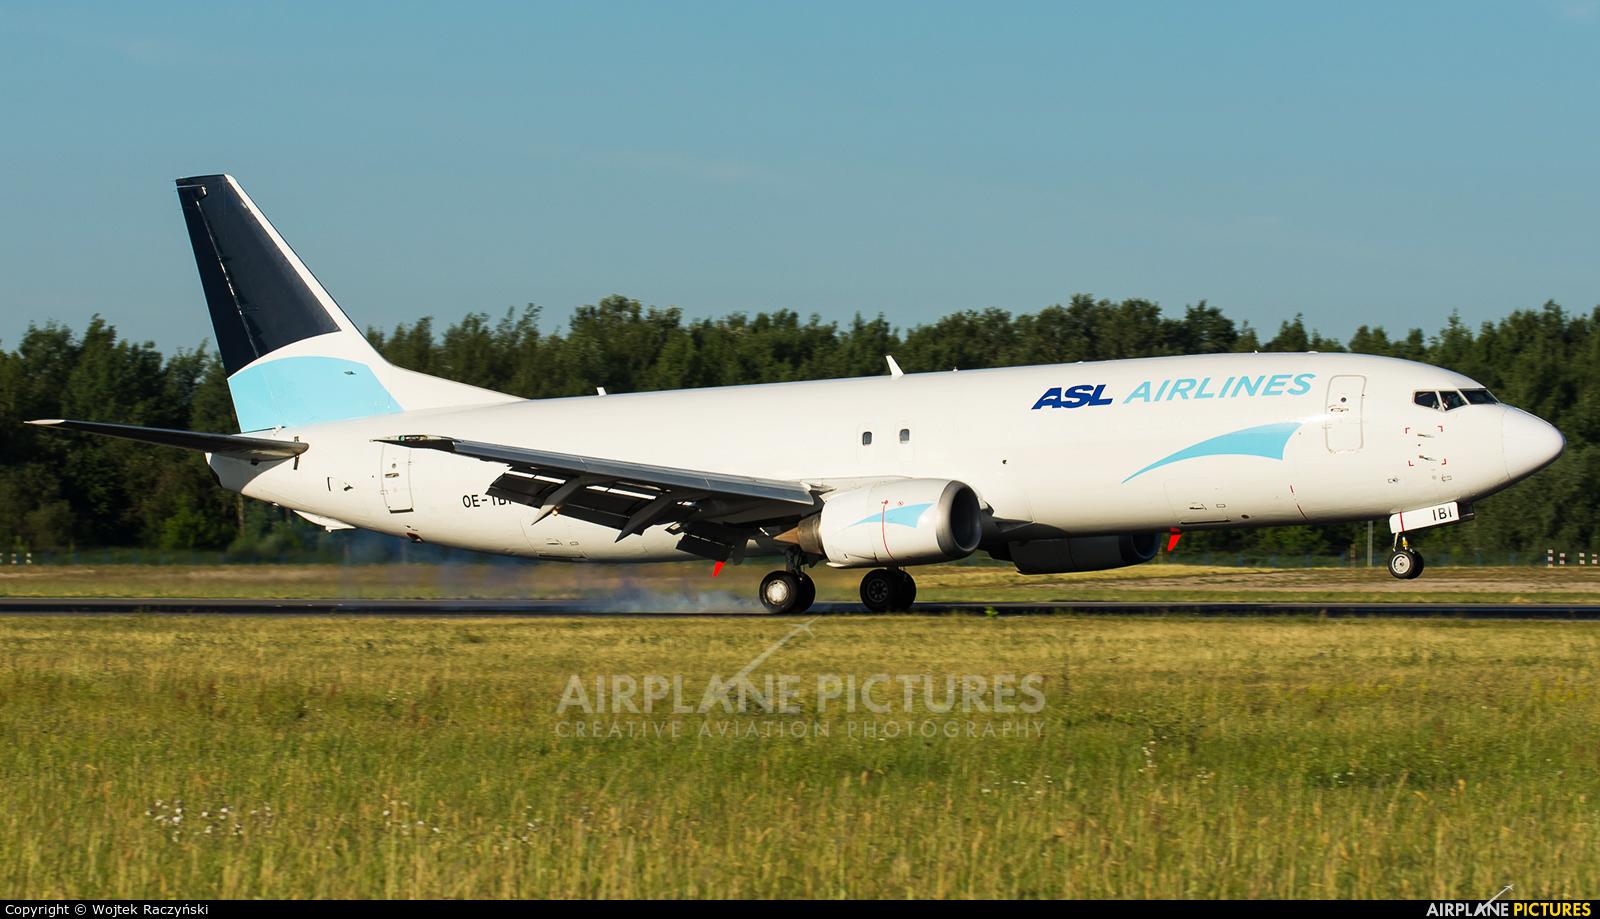 ASL Airlines Belgium OE-IBI aircraft at Warsaw - Frederic Chopin